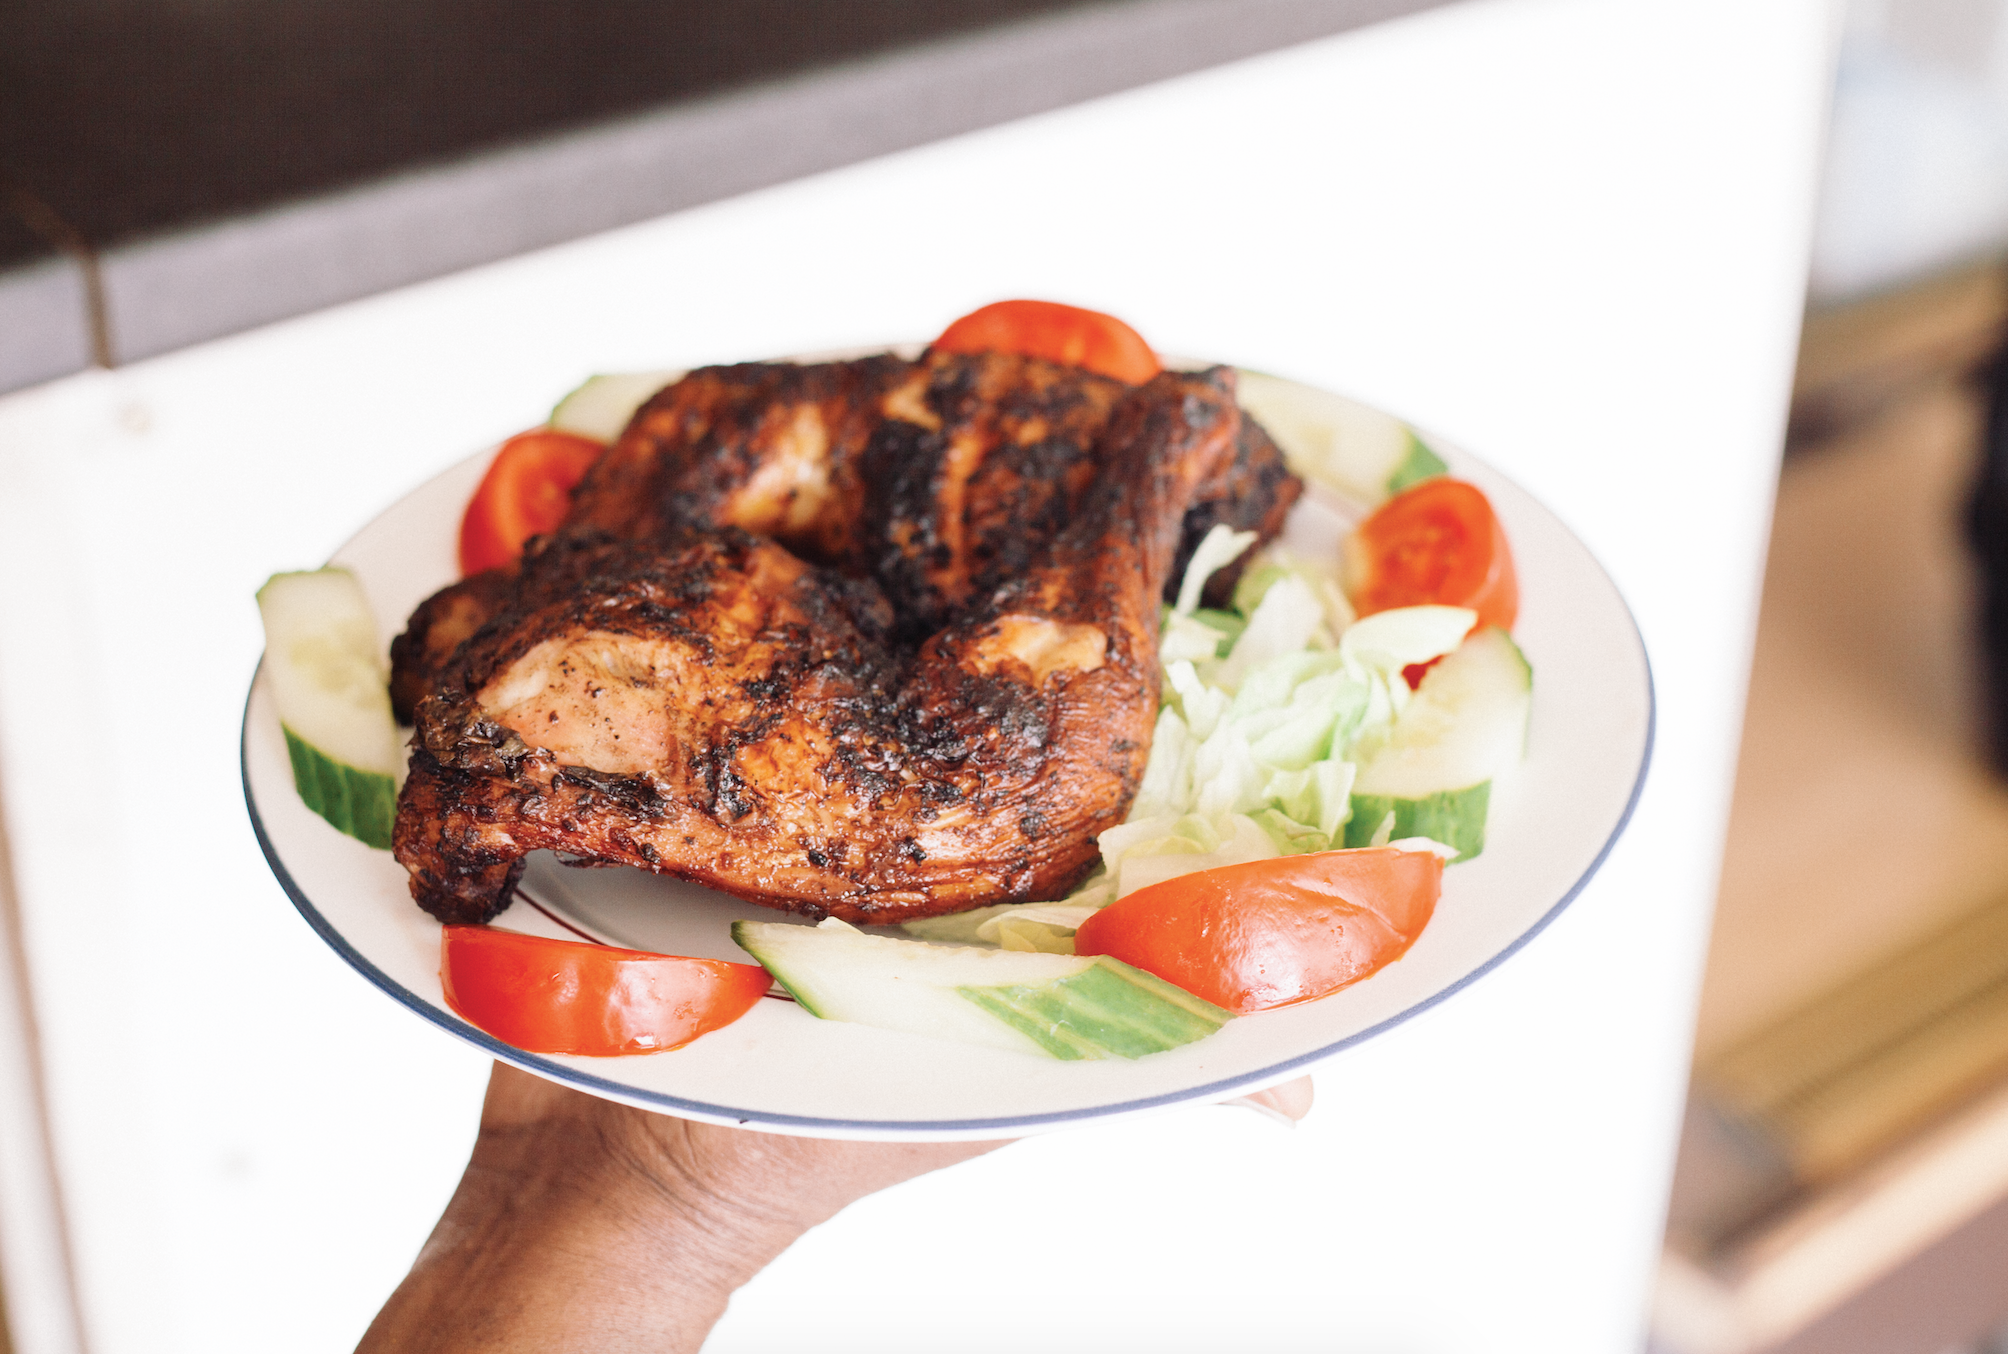 London's best Caribbean jerk: Smokey Jerkey restaurant on New Cross Road